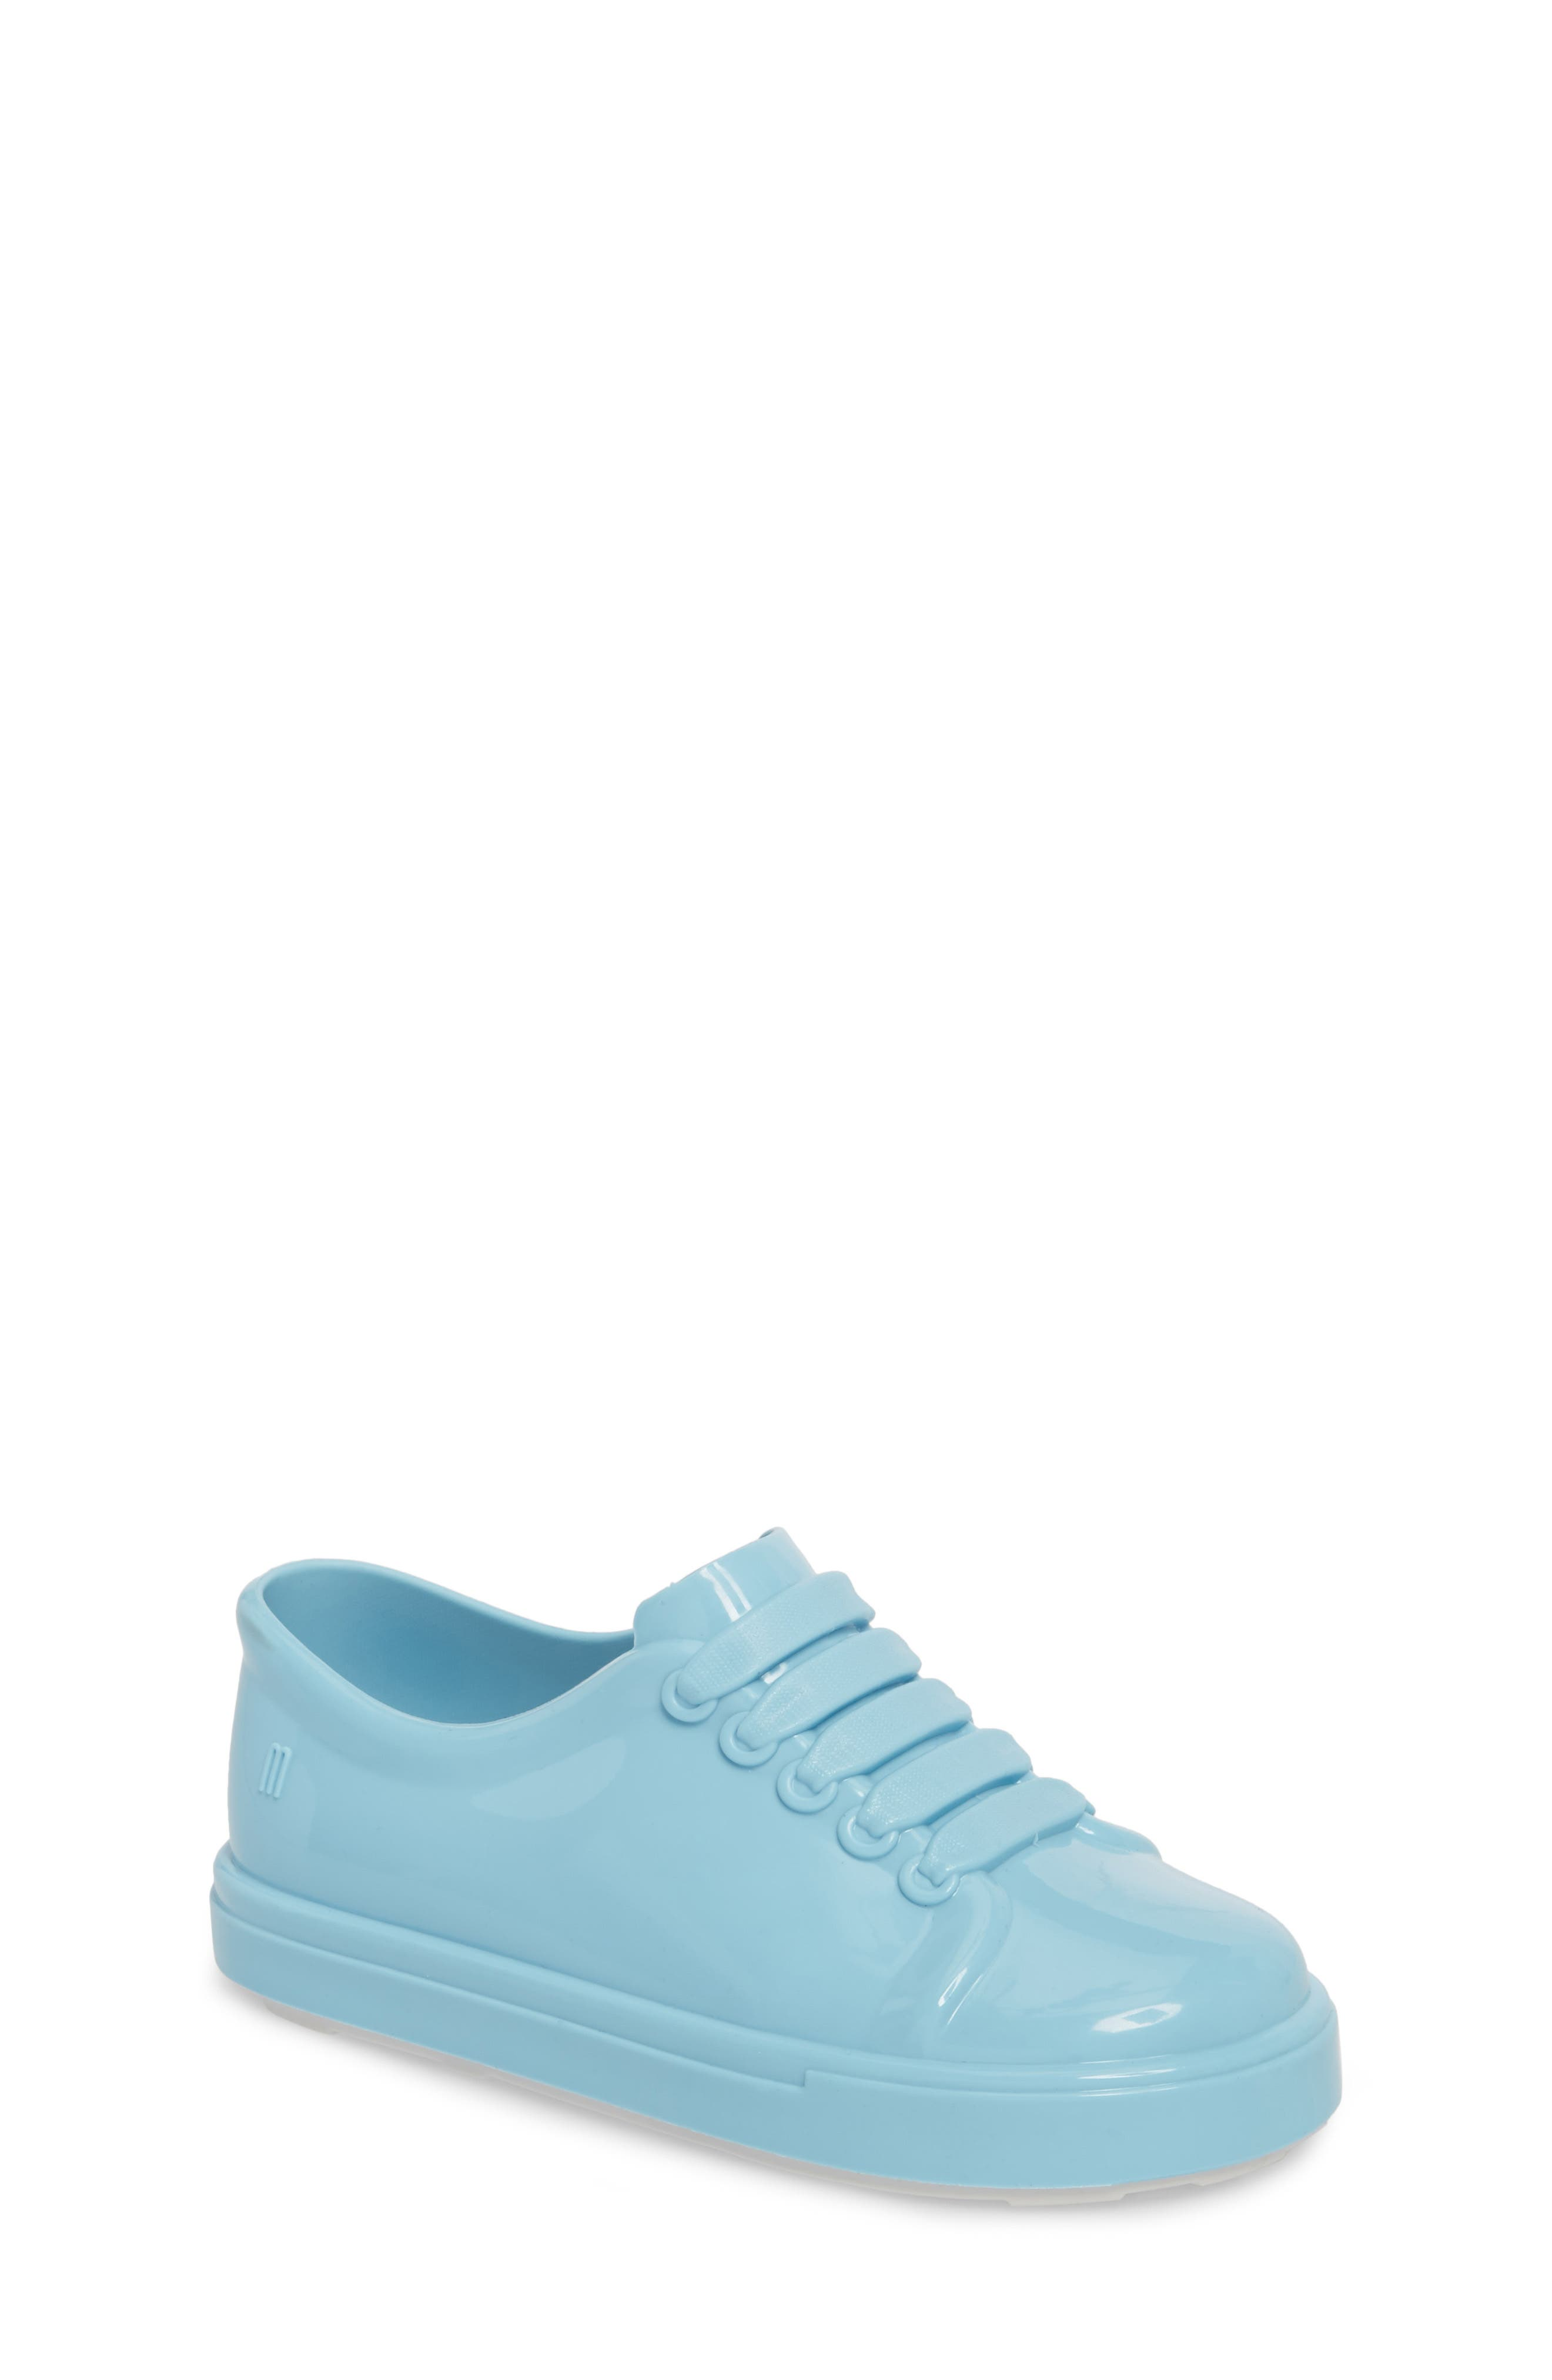 Be Slip-On Sneaker,                             Main thumbnail 1, color,                             433